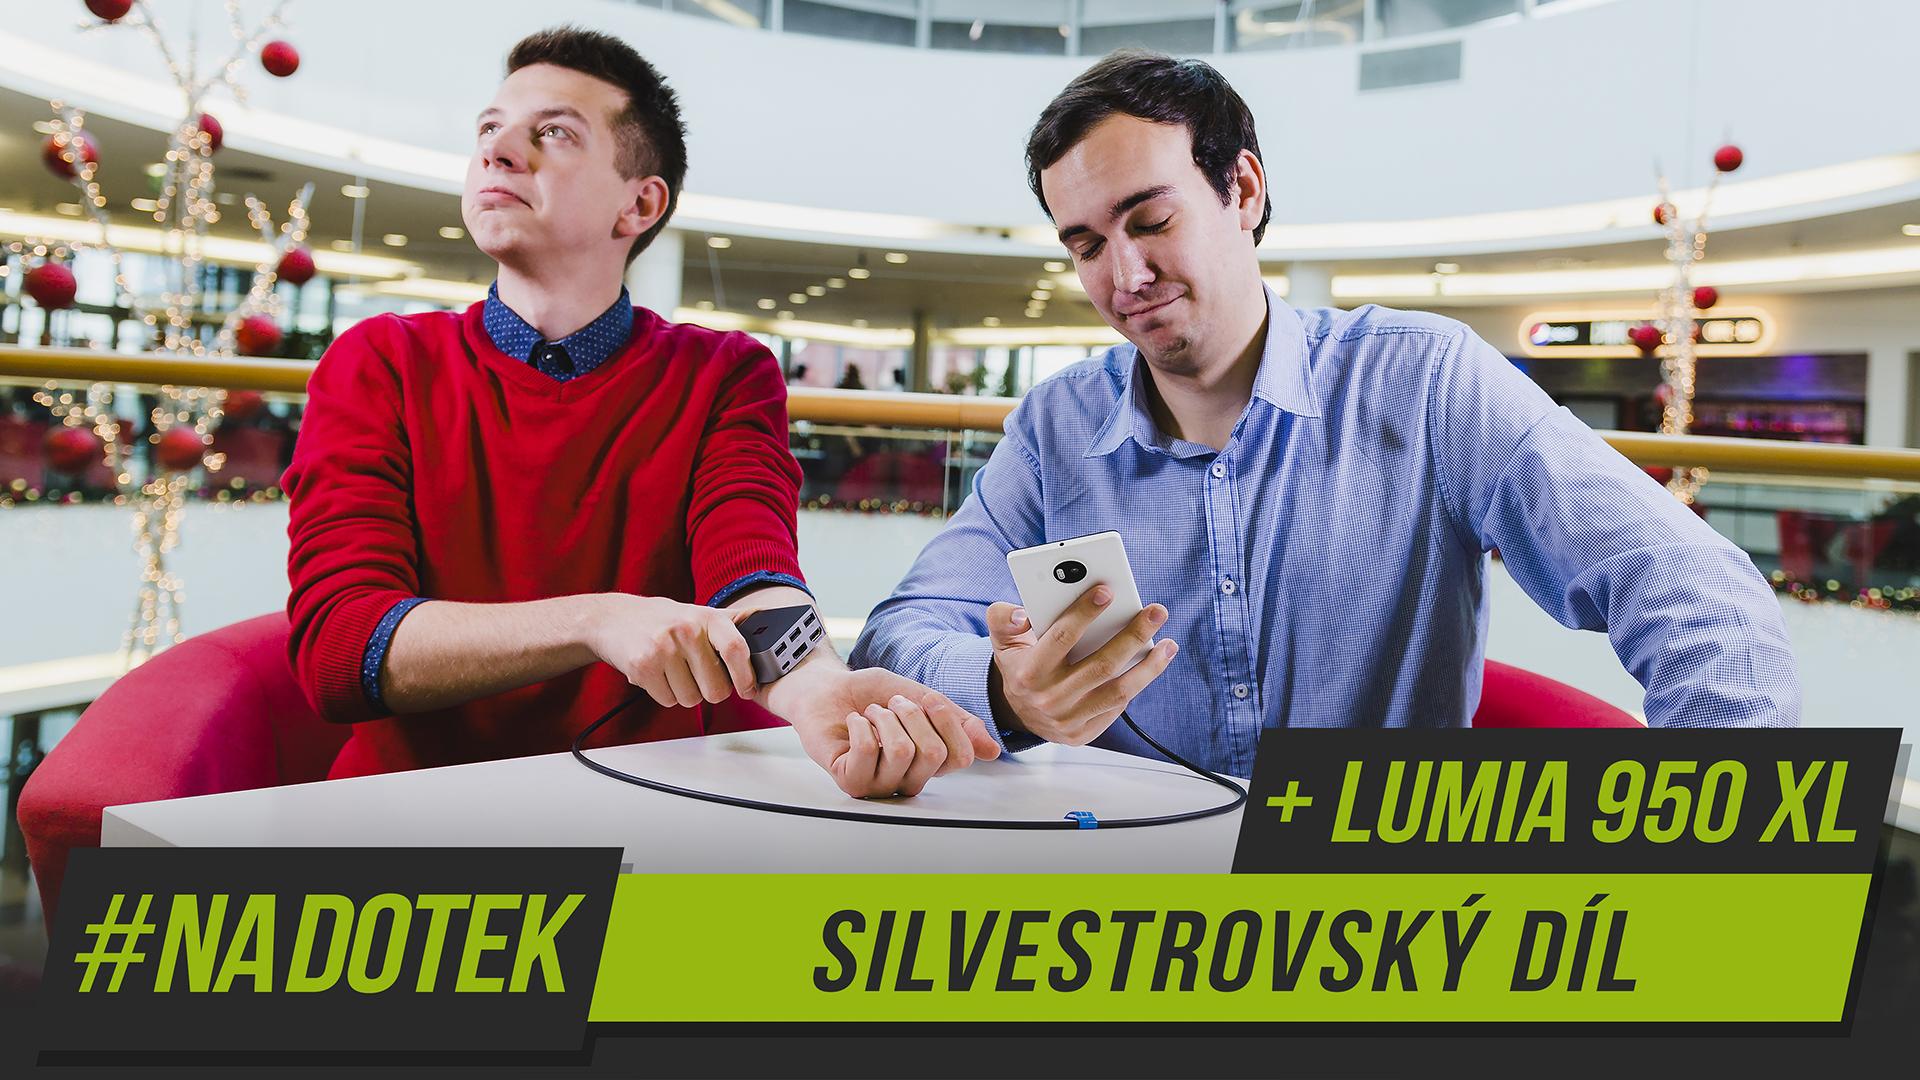 Na Dotek – Silvestr 2015 + Microsoft Lumia 950 XL